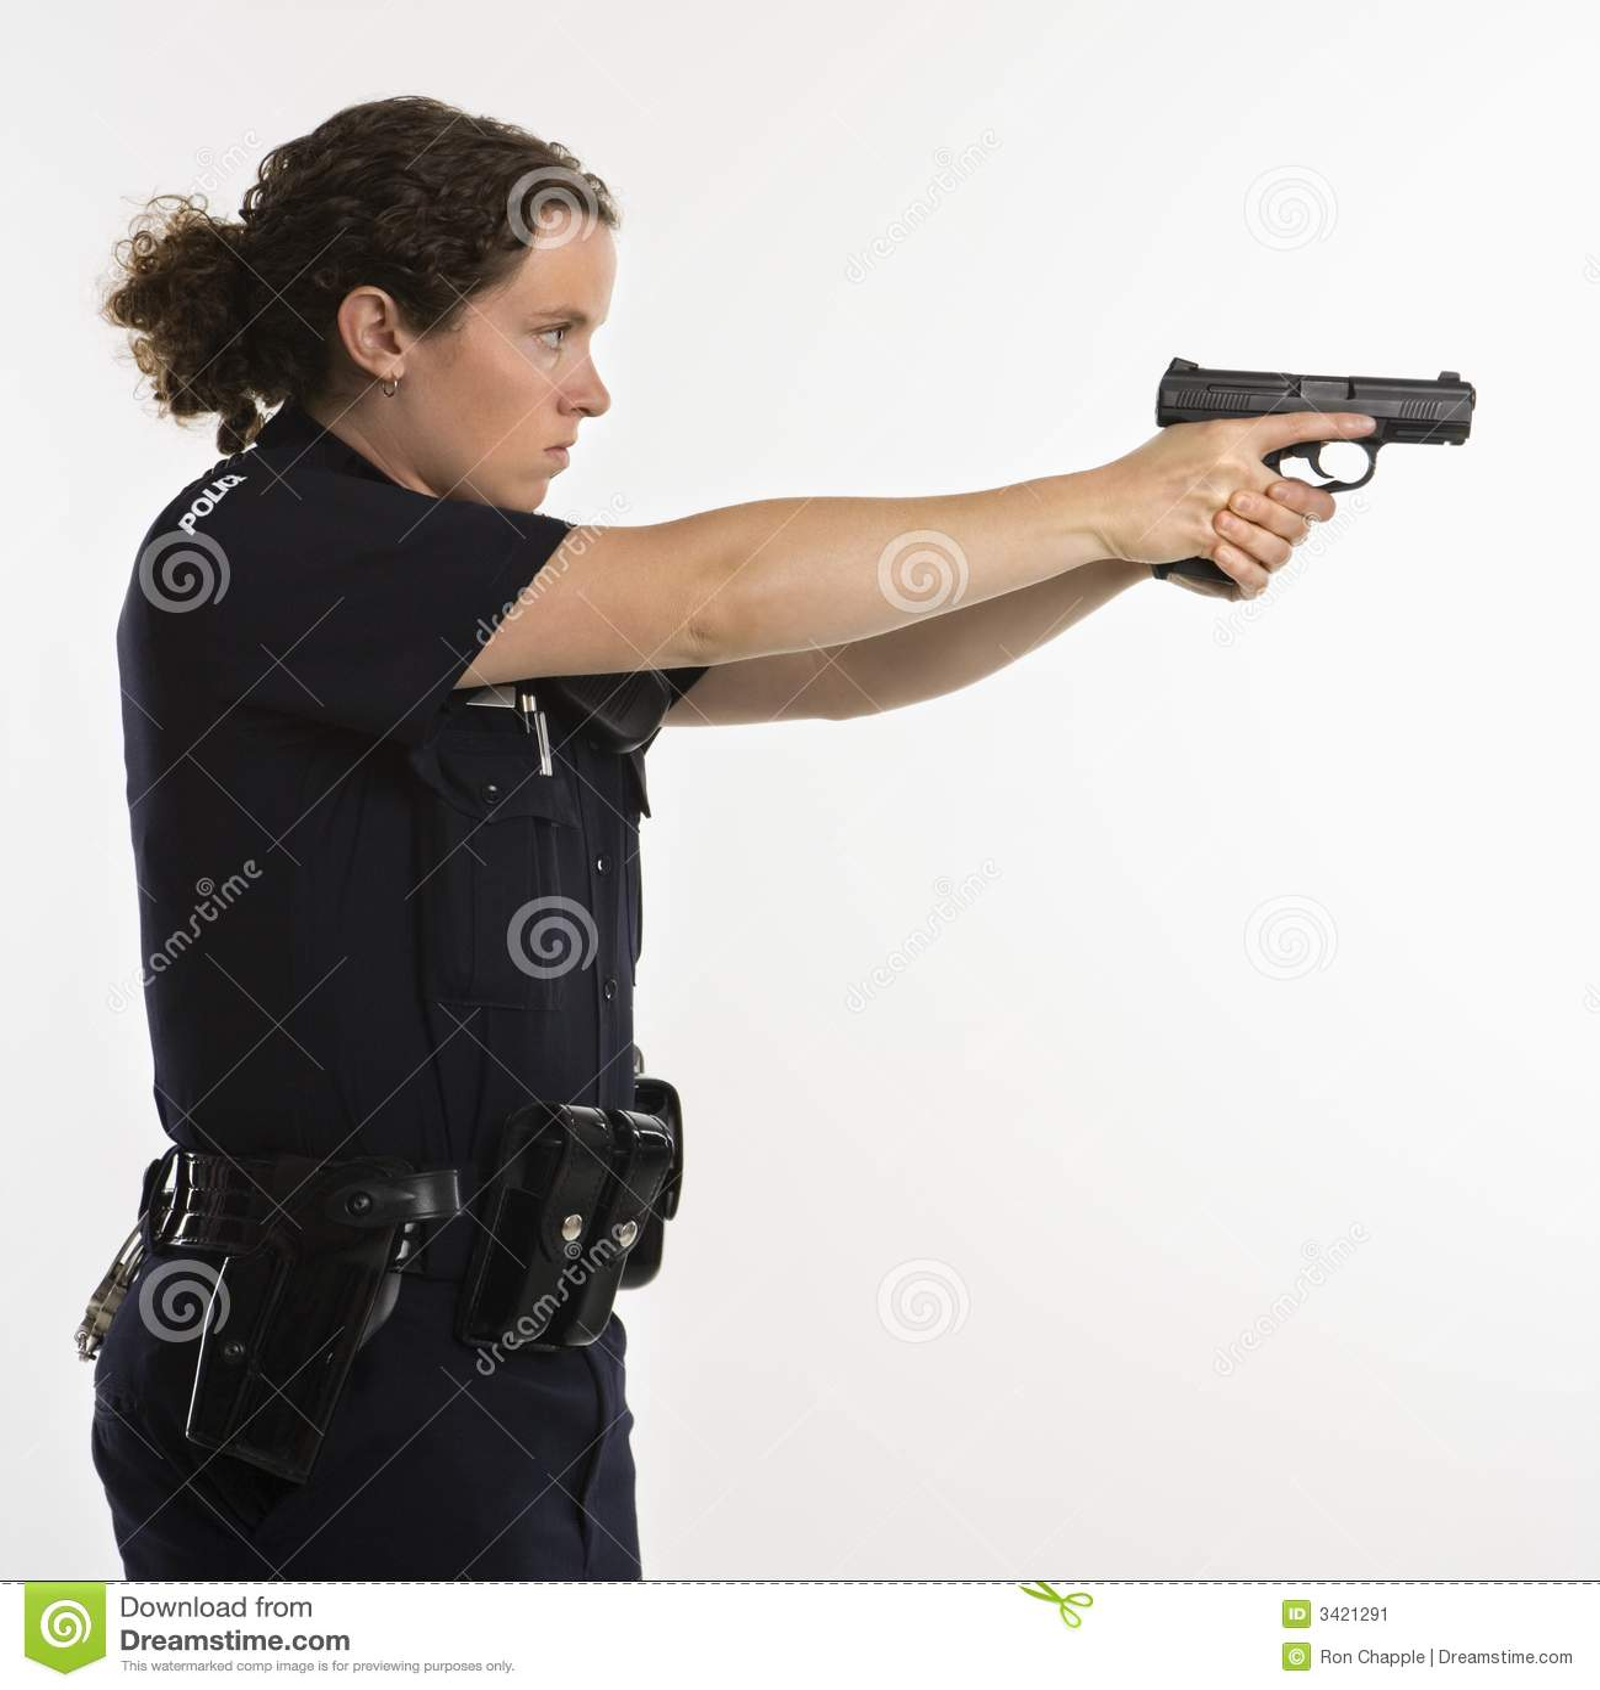 Policewoman aiming gun. stock image. - 82.6KB